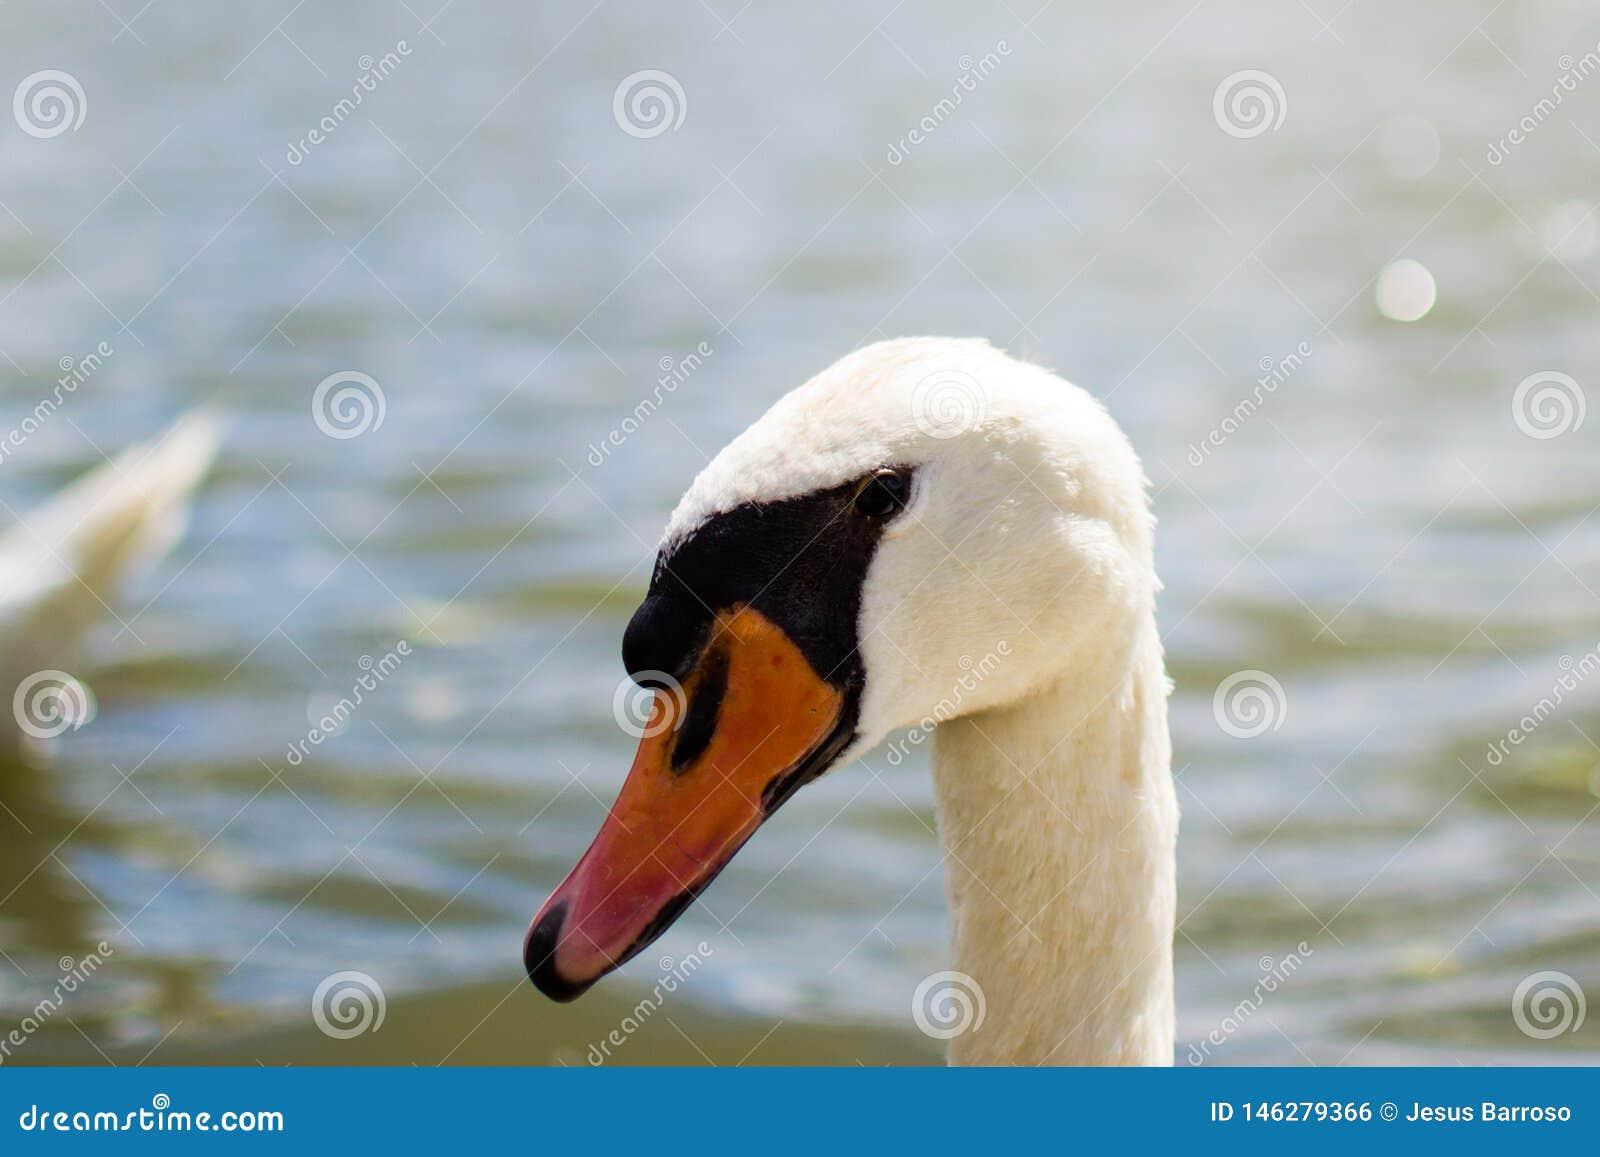 Close up of the head of a white goose. Black eyes and orange beak